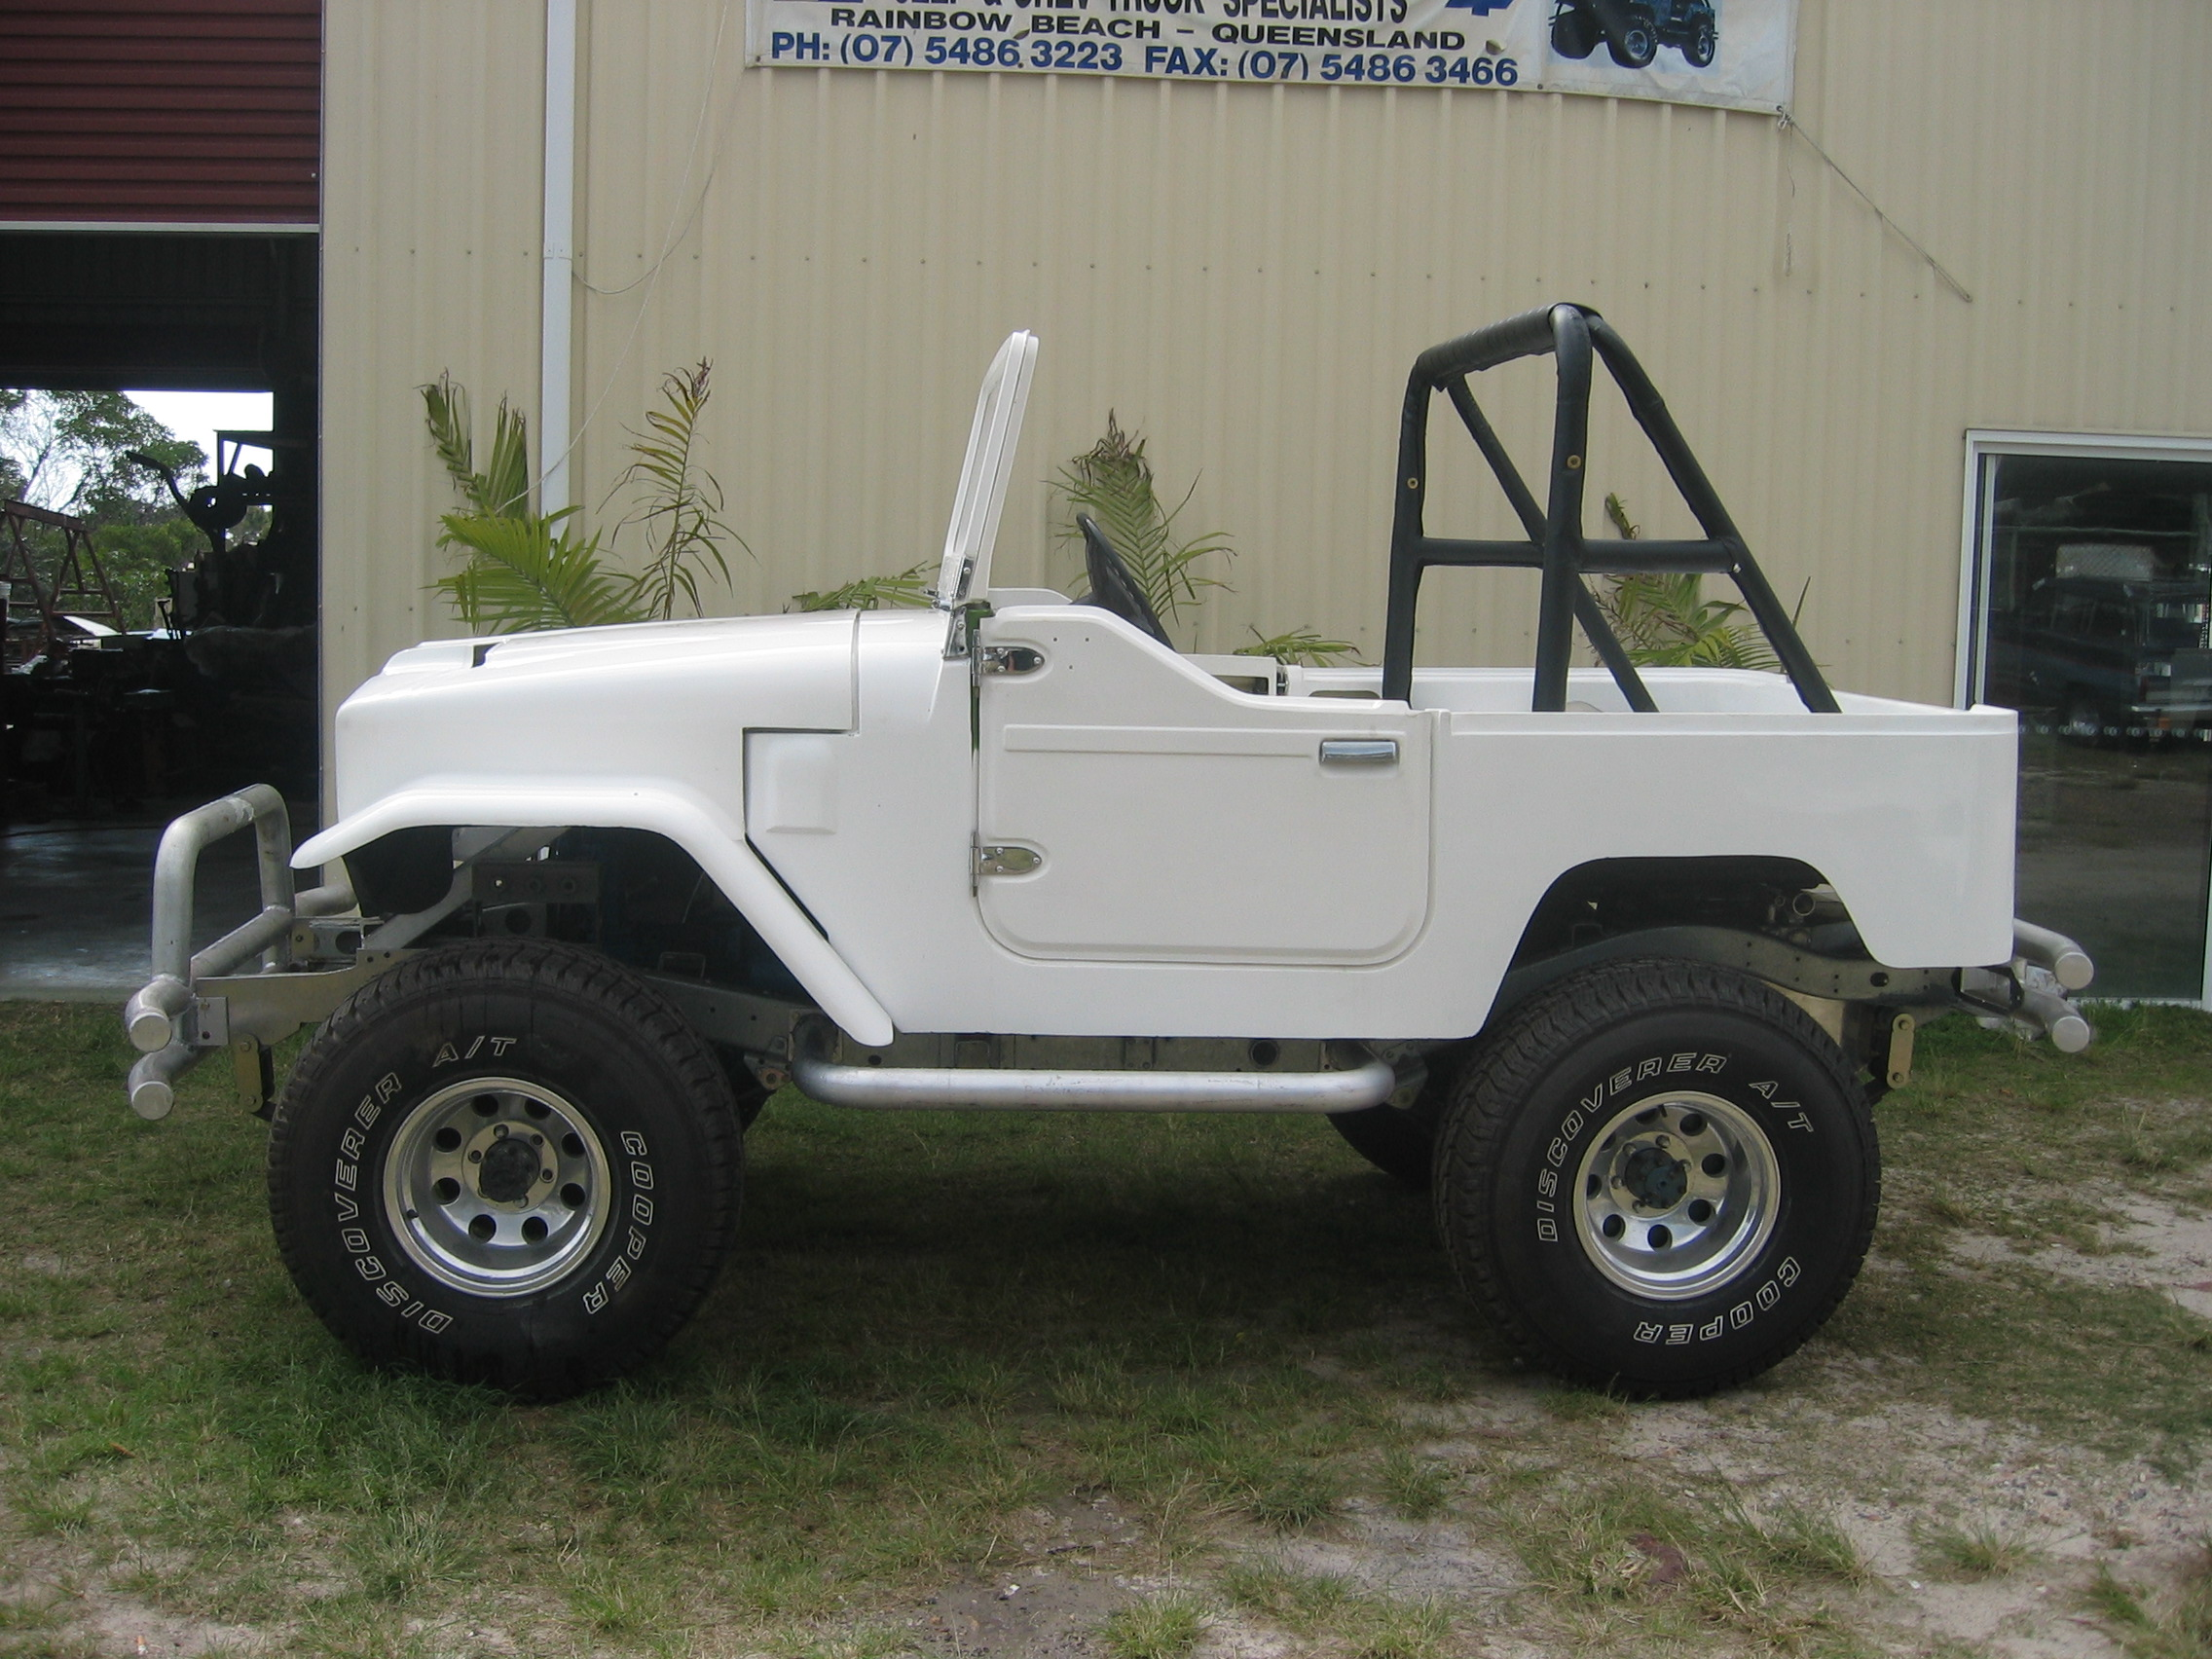 40 Series Parts Landcruiser Parts Amp Restoration